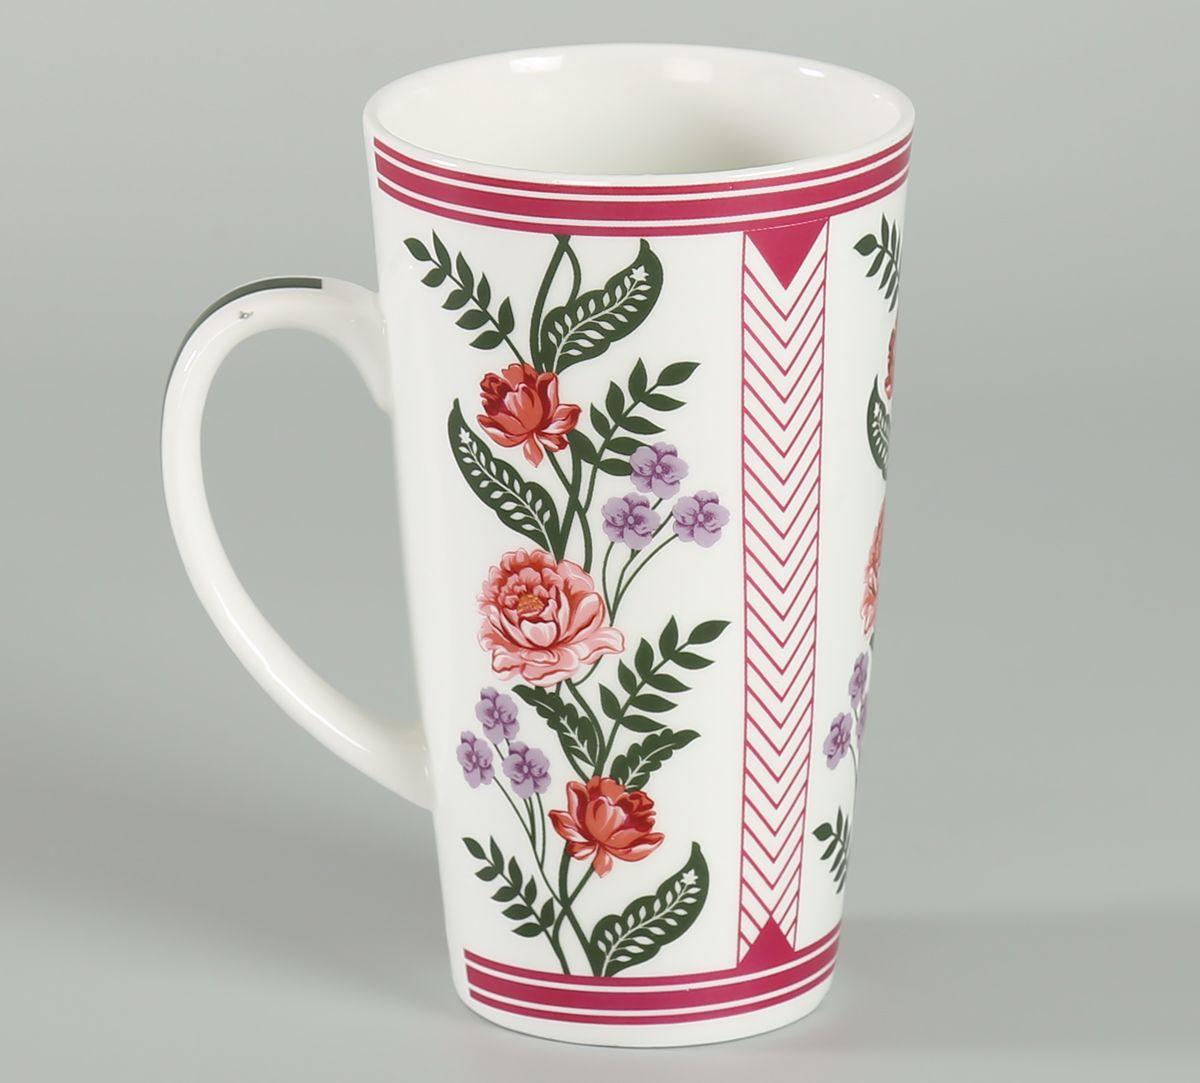 India Circus Verdure Mystery Conical Mug (Set of 2)